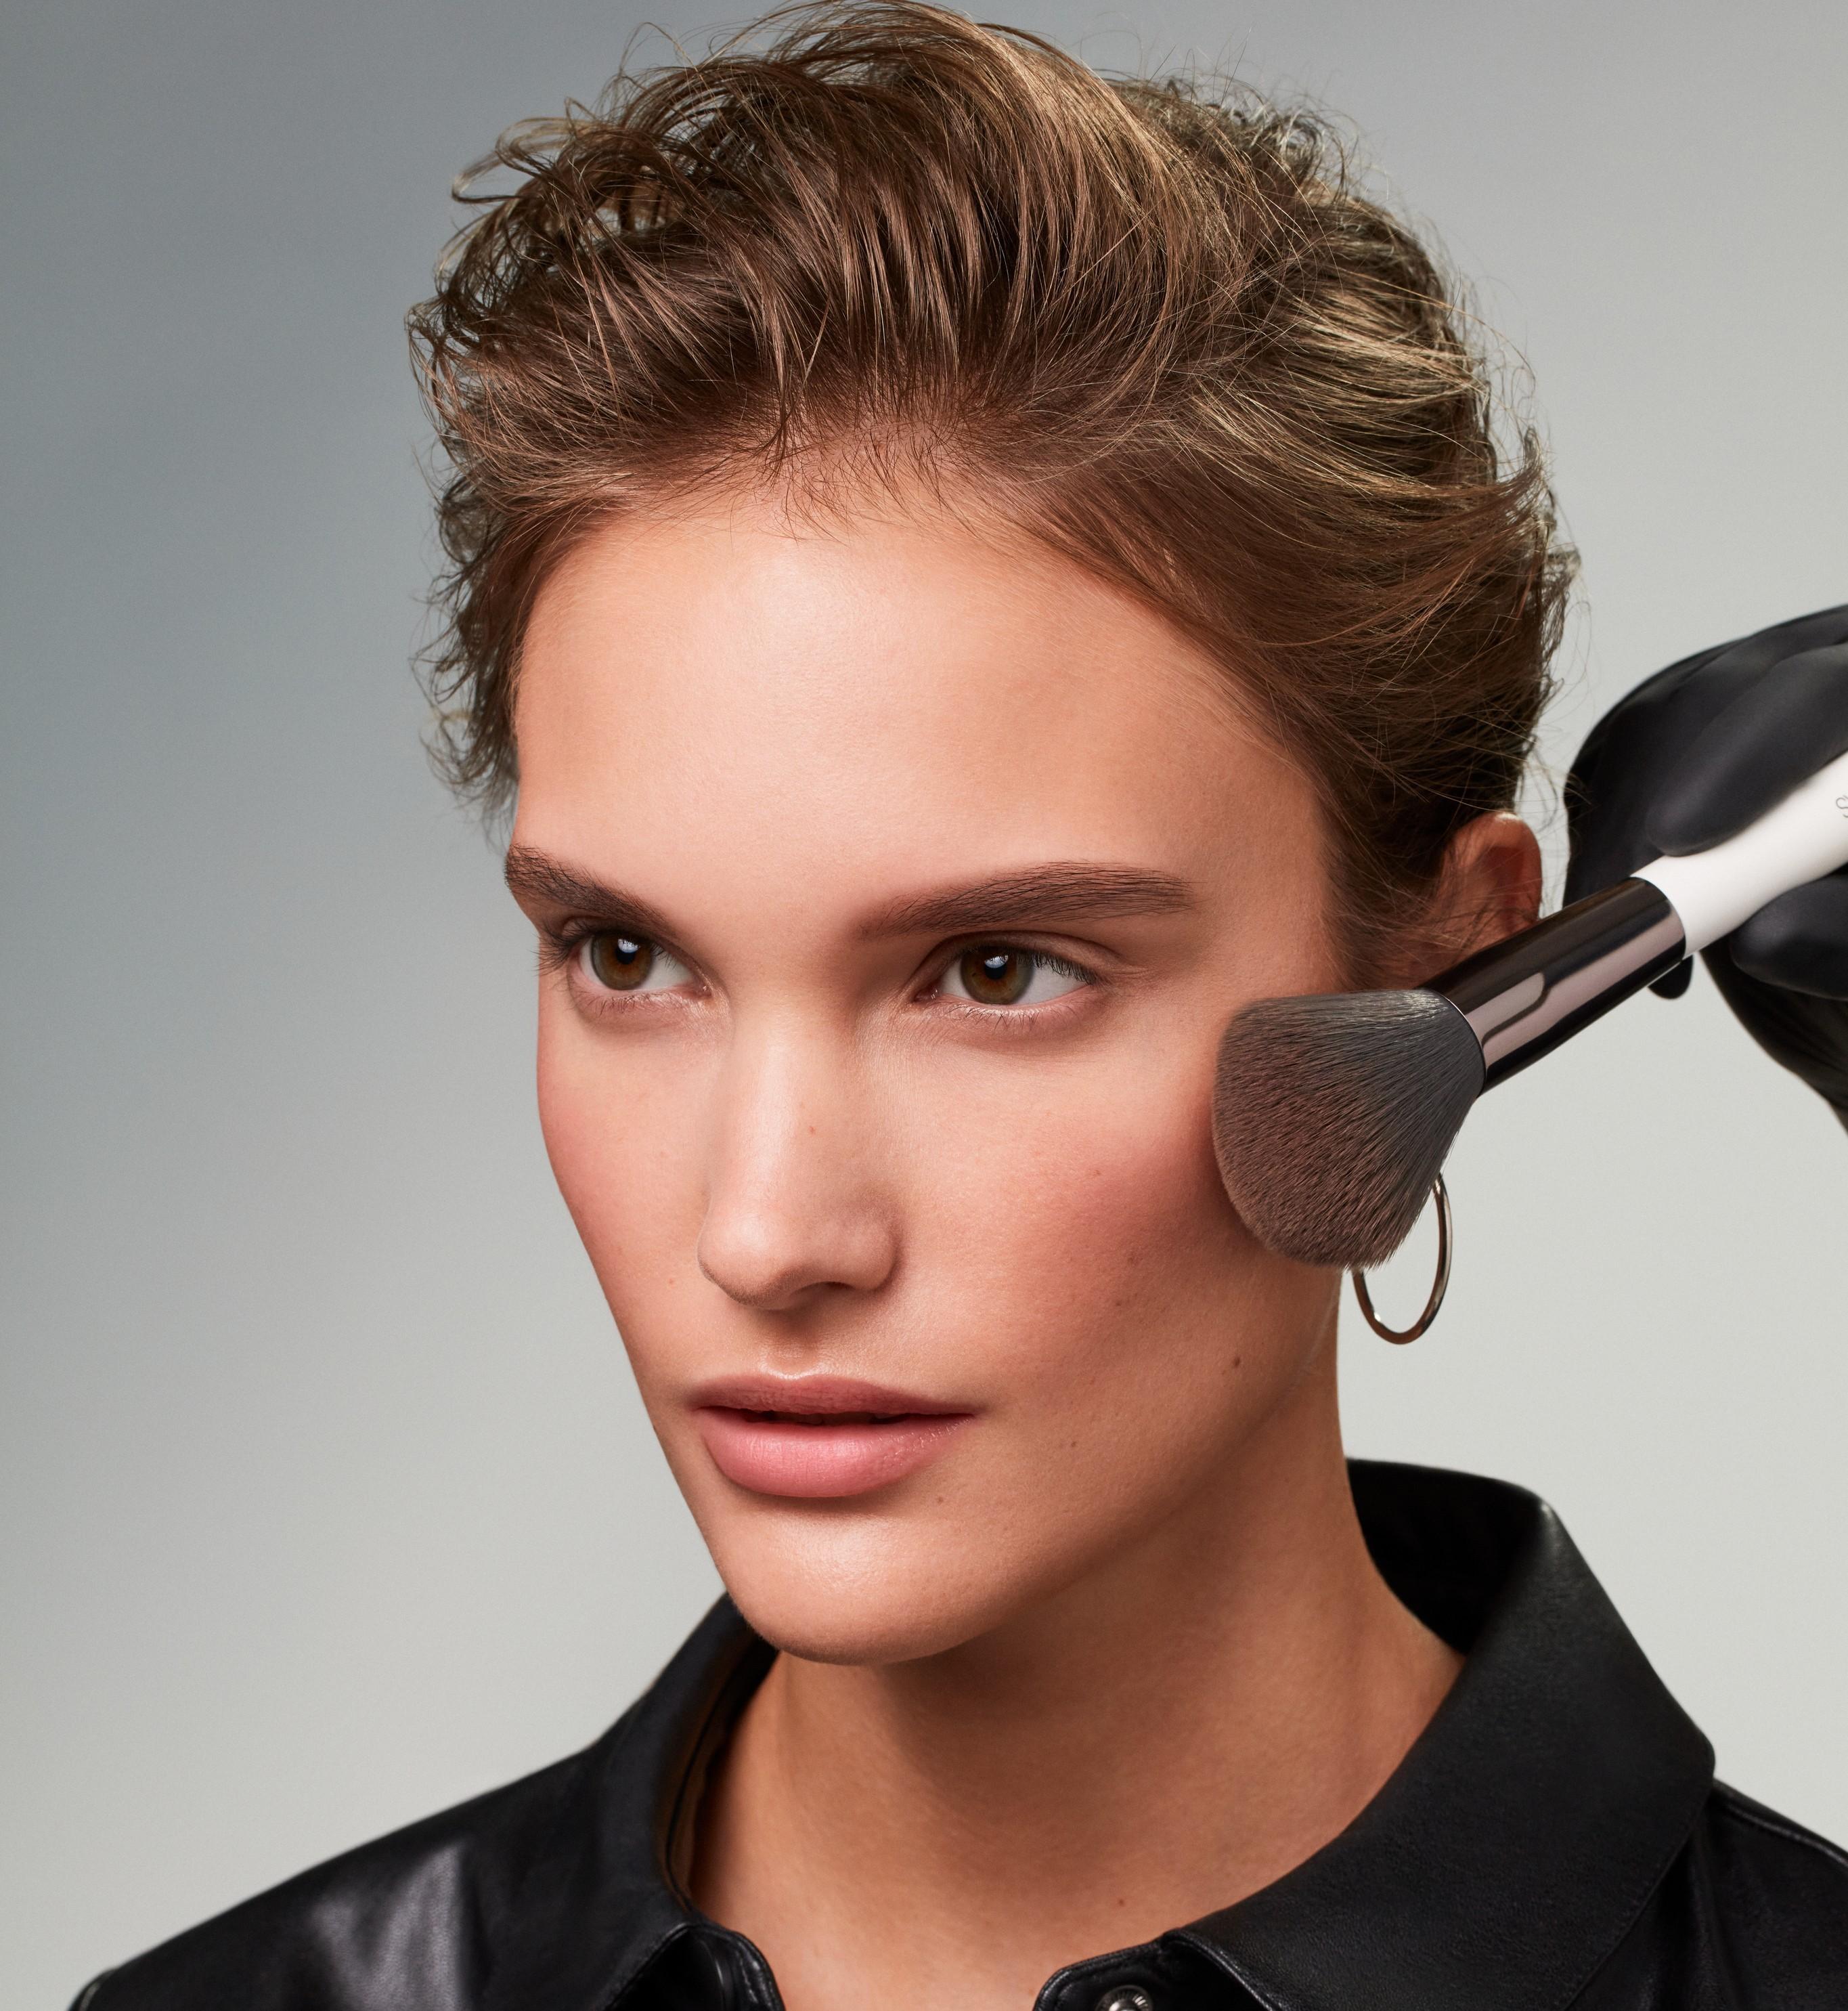 Makeup-application-1-smokey-eyes-062023-Web-RenditionenDJ7aNHVLd77